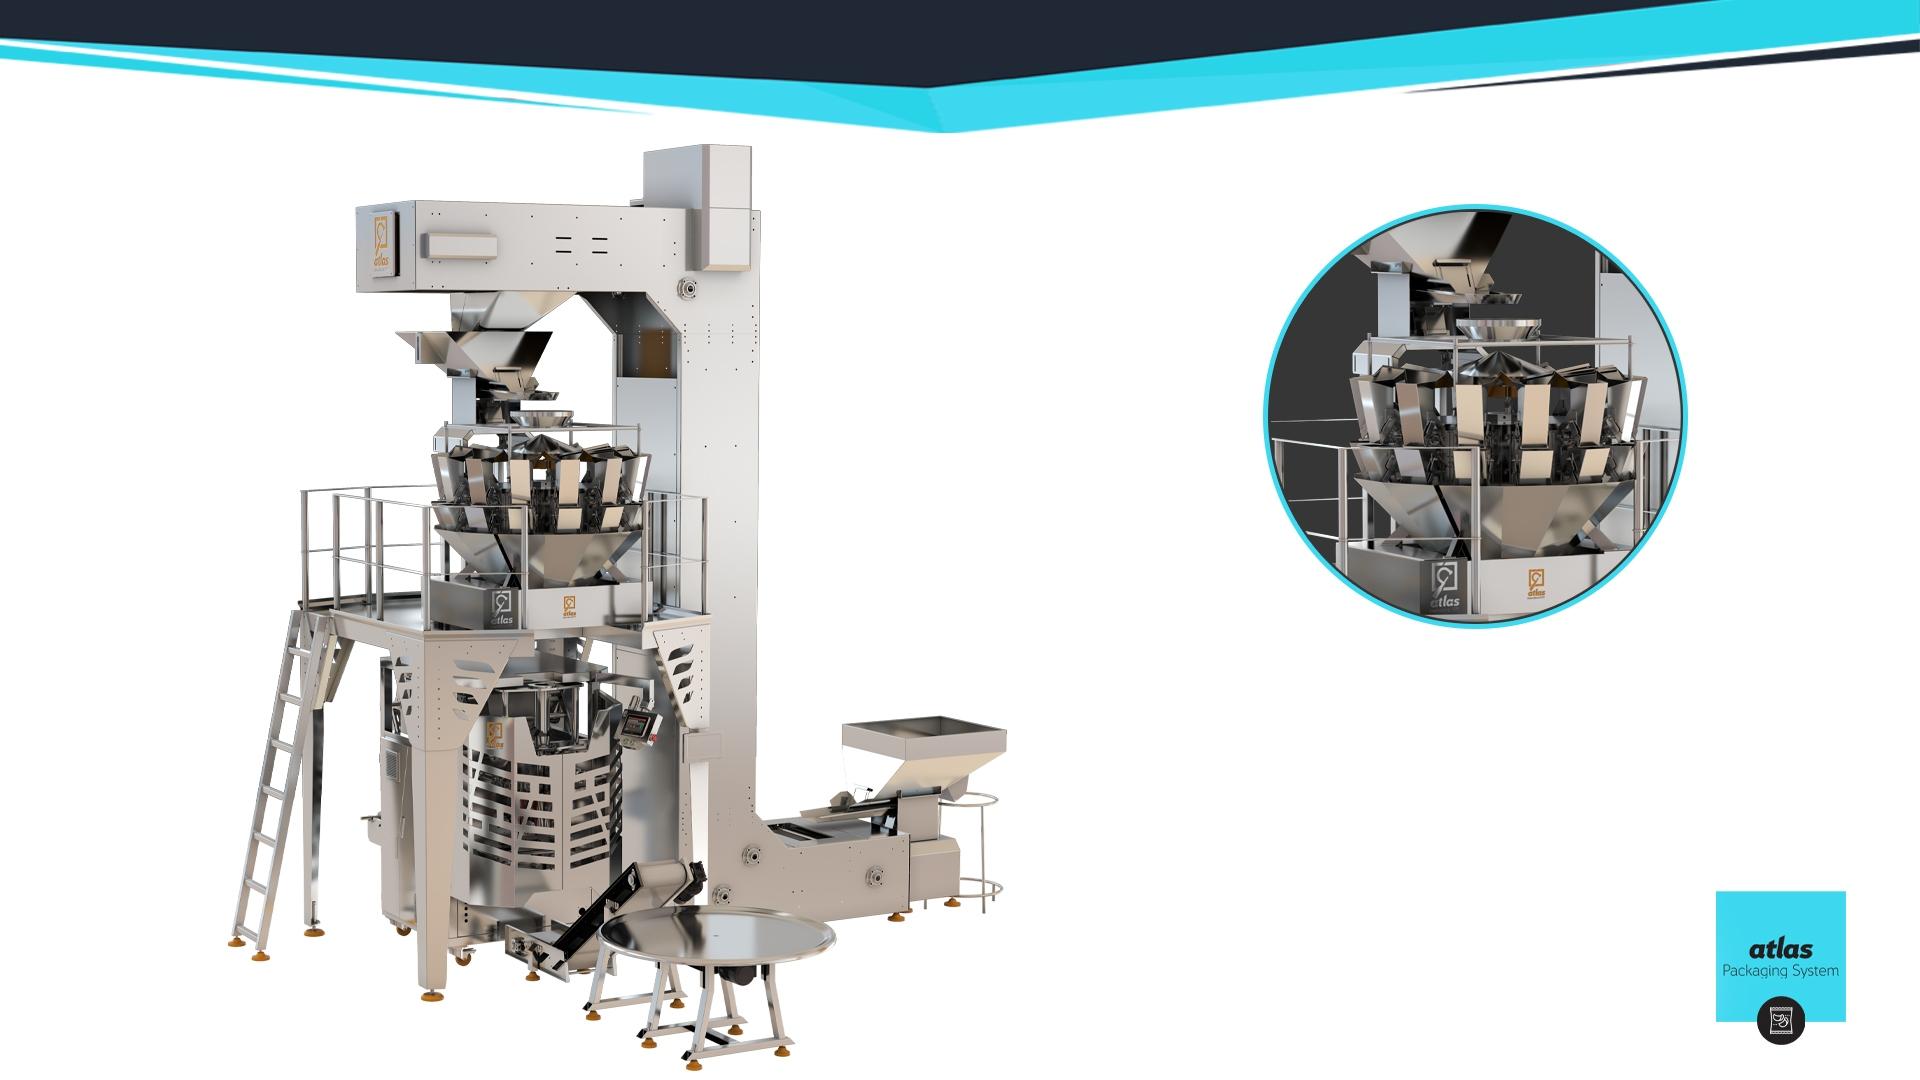 PMWF 80 خط تعبئة وتغليف وزنية محركات سيرفو  / شيبس - مكسرات - سكاكر - شاي-تمور